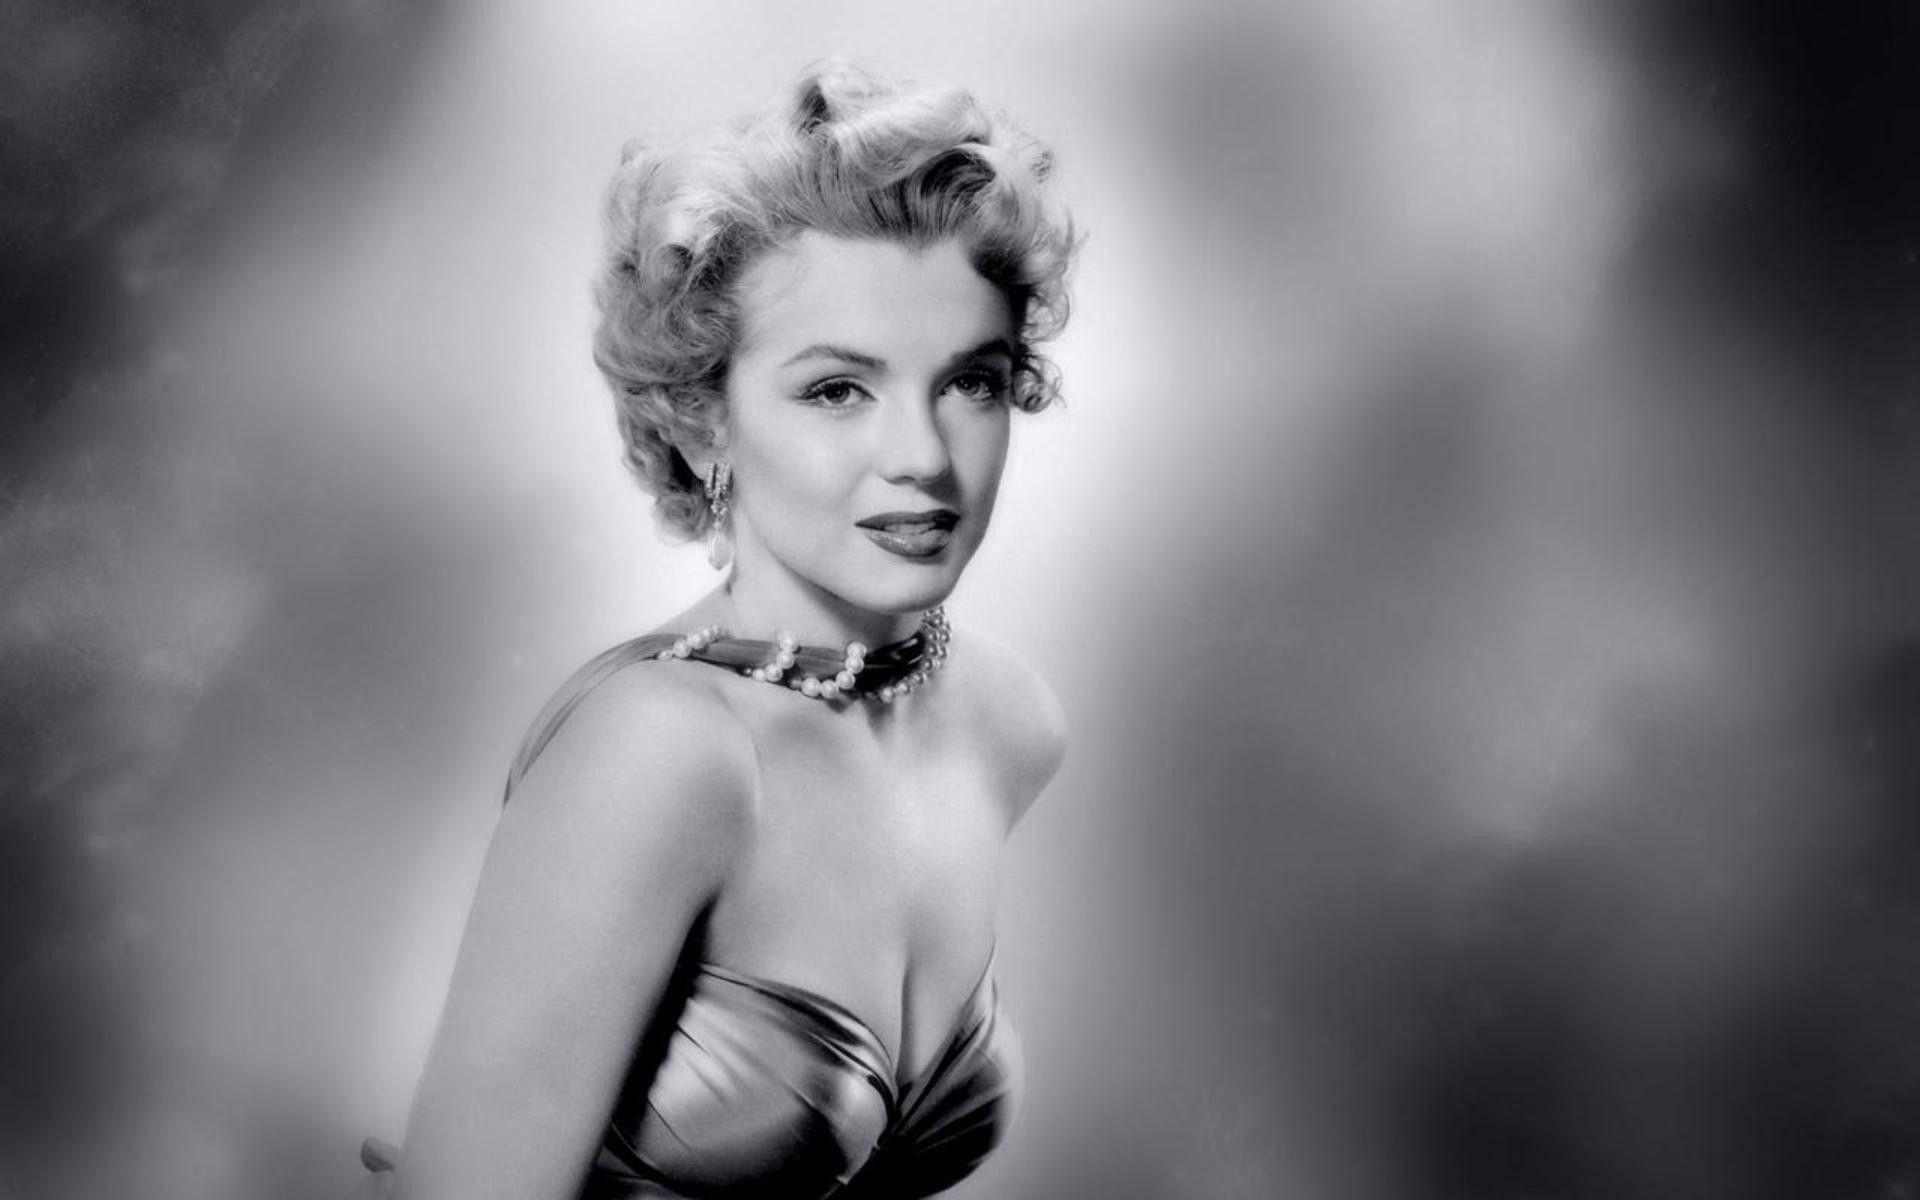 Marilyn monroe wallpaper 63 images - Marilyn monroe wallpaper download ...